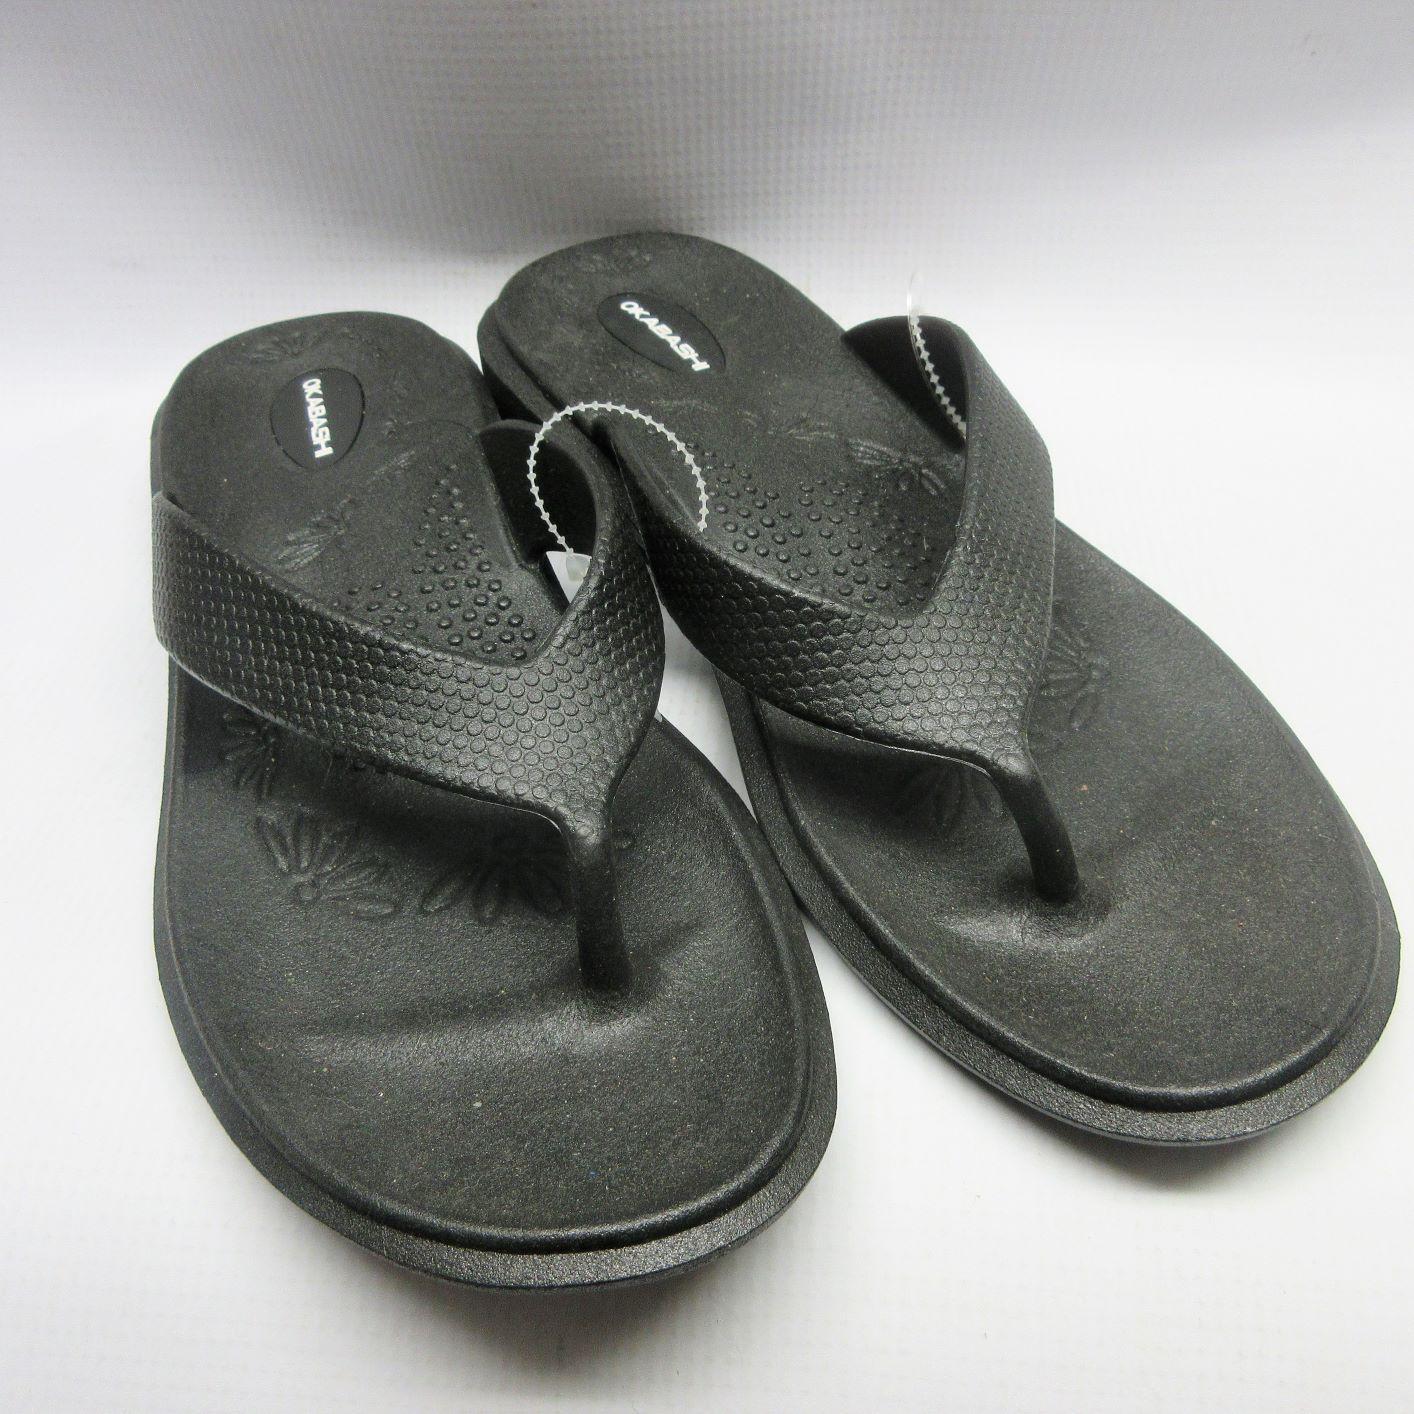 Okabashi Sandals Women Maui Flip Flops